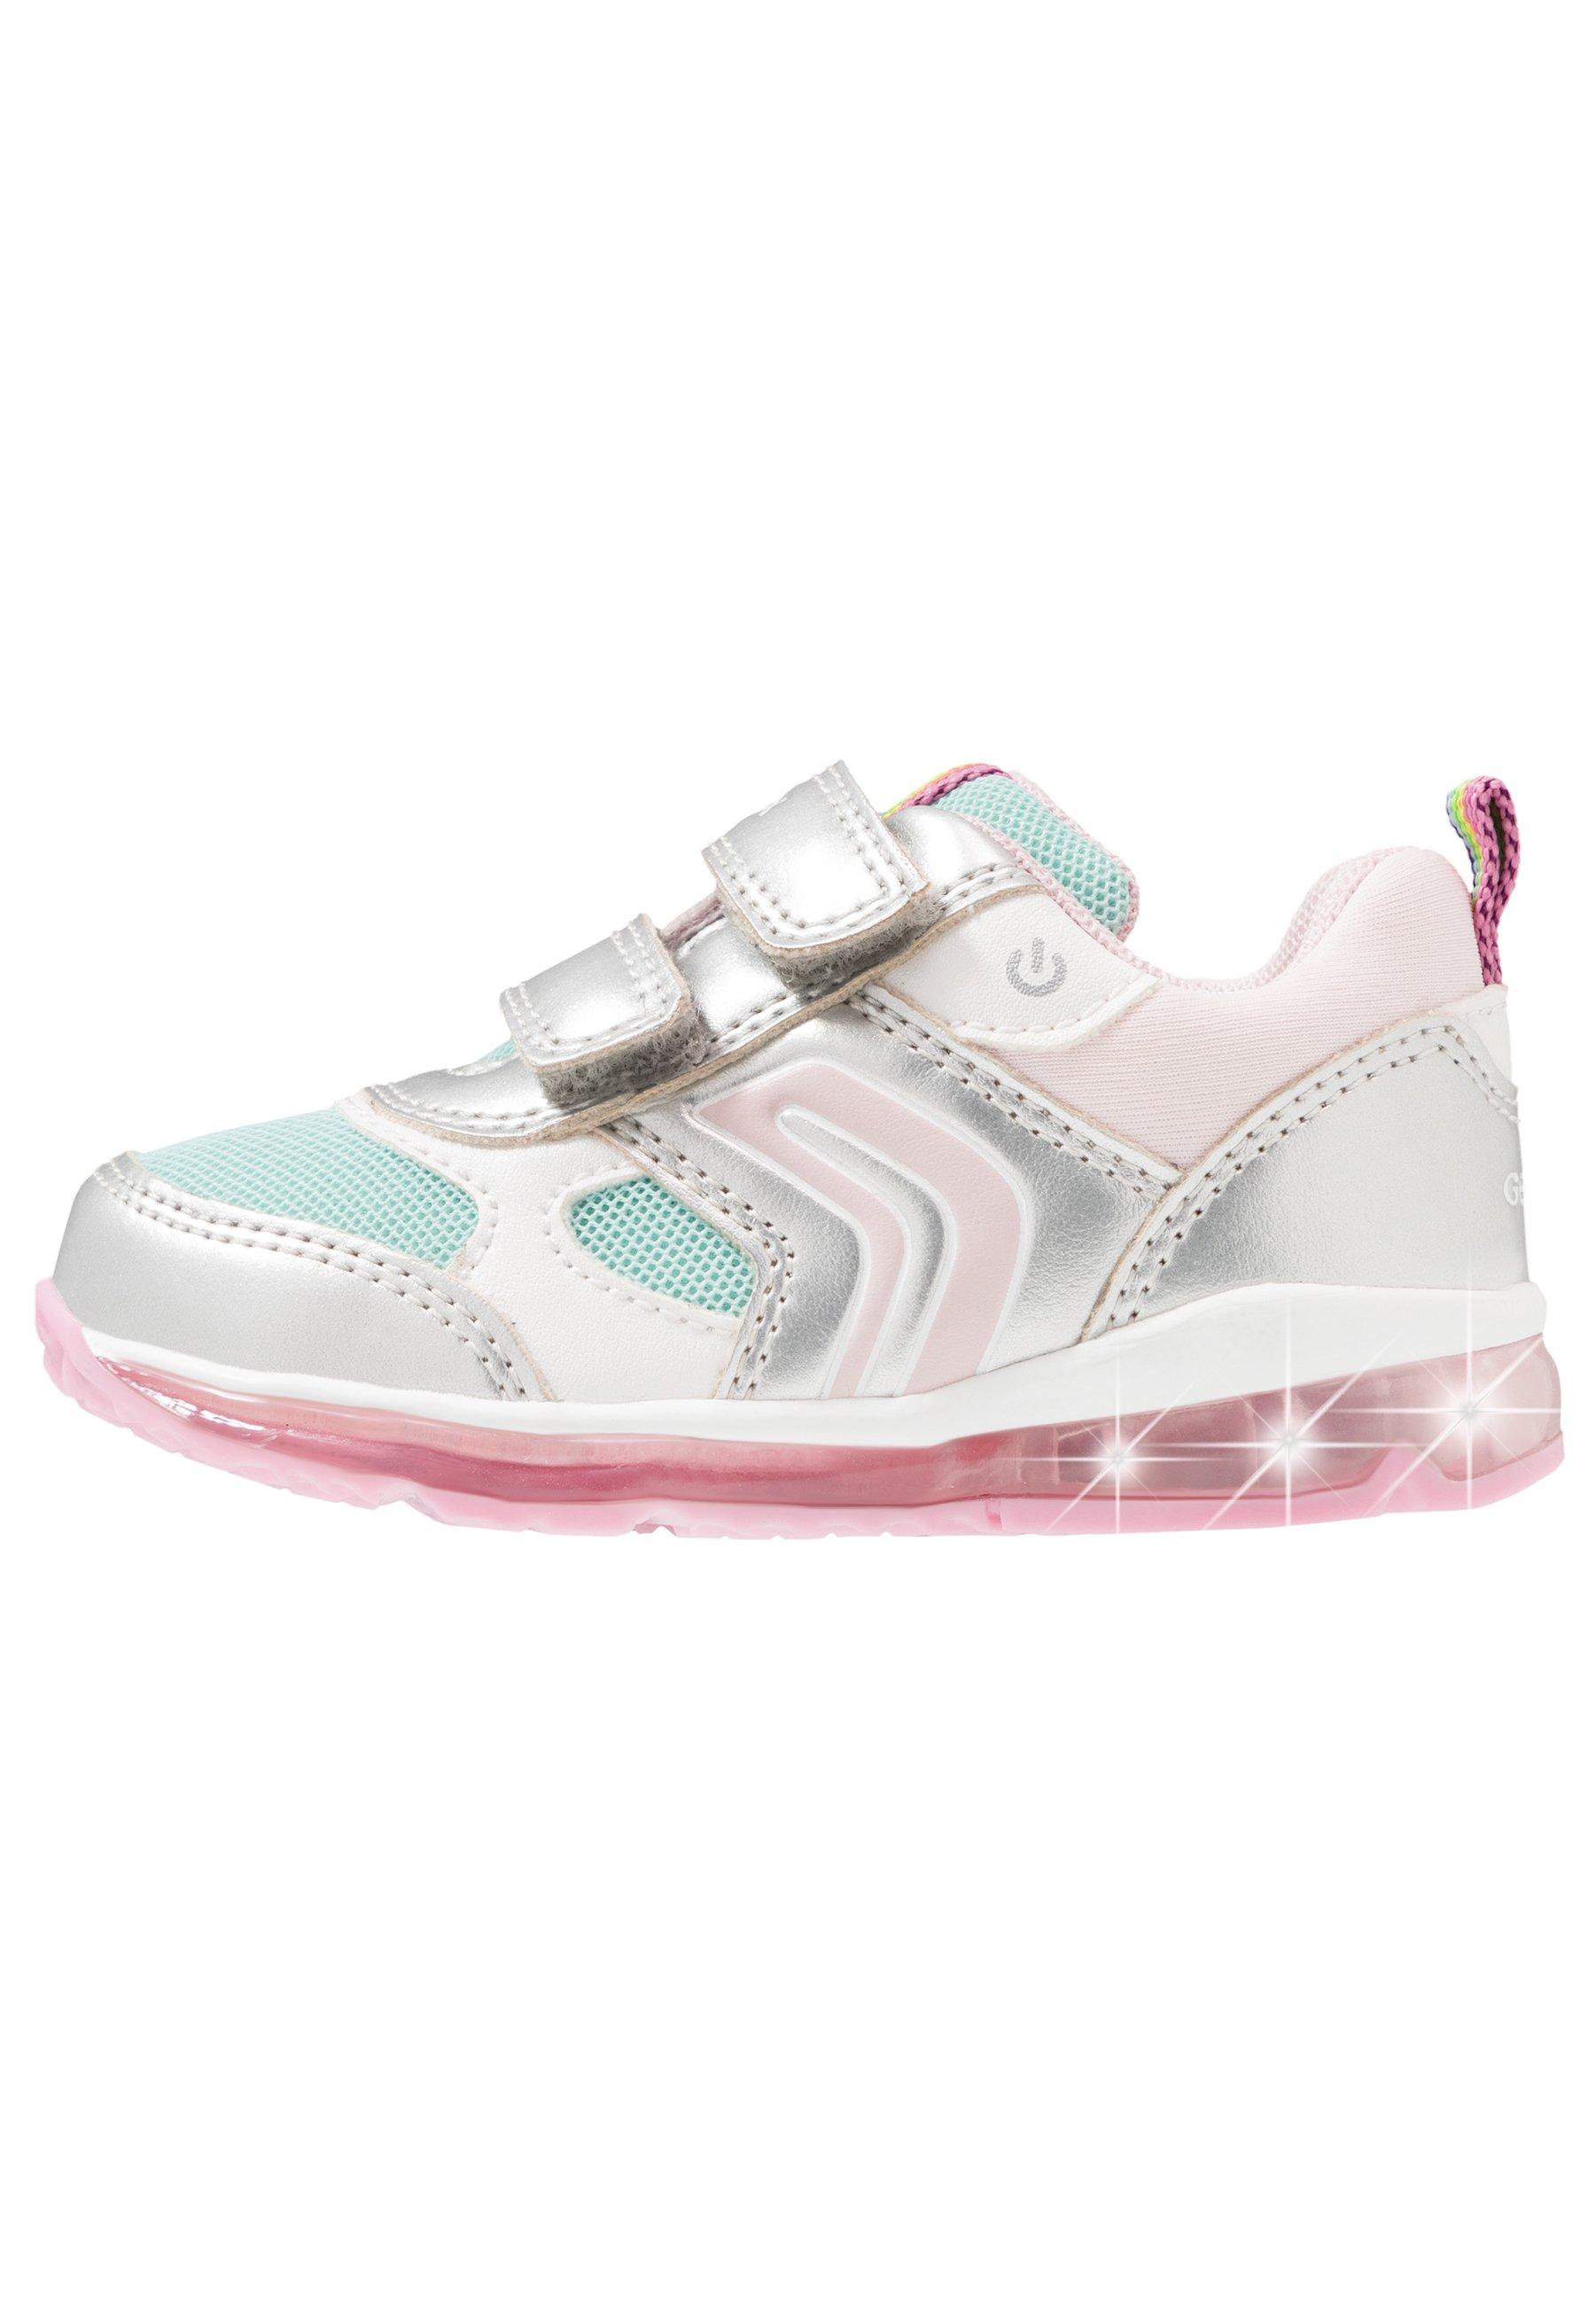 Geox TODO GIRL Sneaker low silveraqua